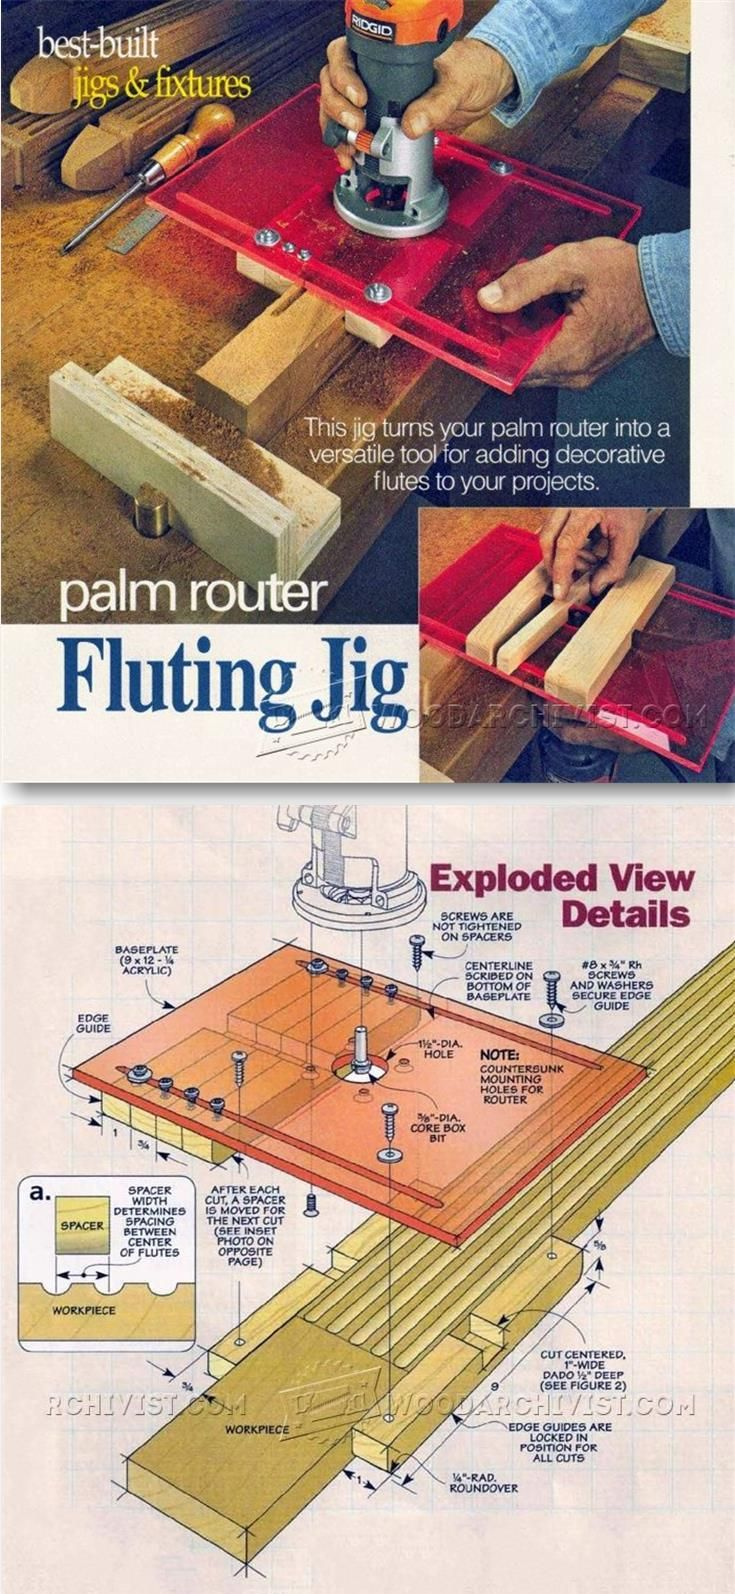 DIY Router Fluting Jig - Woodworking Tips and Techniques | WoodArchivist.com